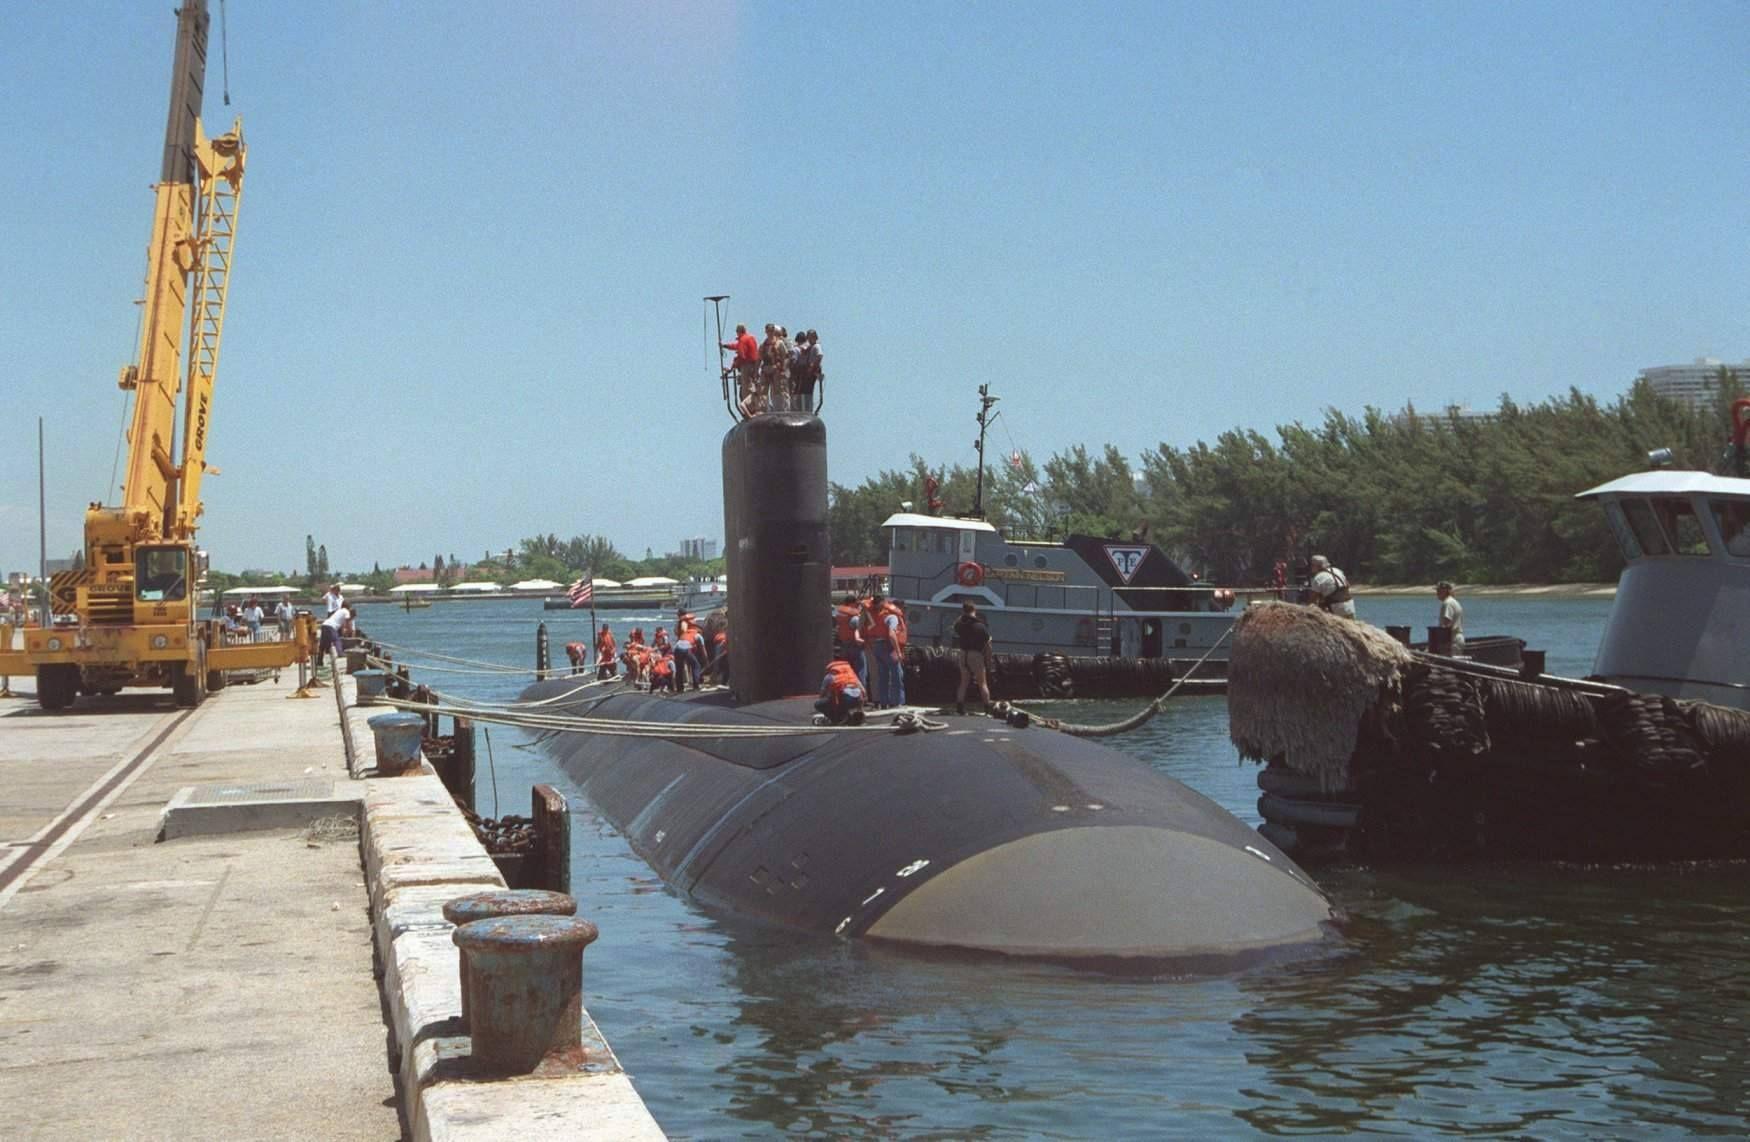 (Jun 29, 1991), USS ALEXANDRIA (SSN 757) was commissioned